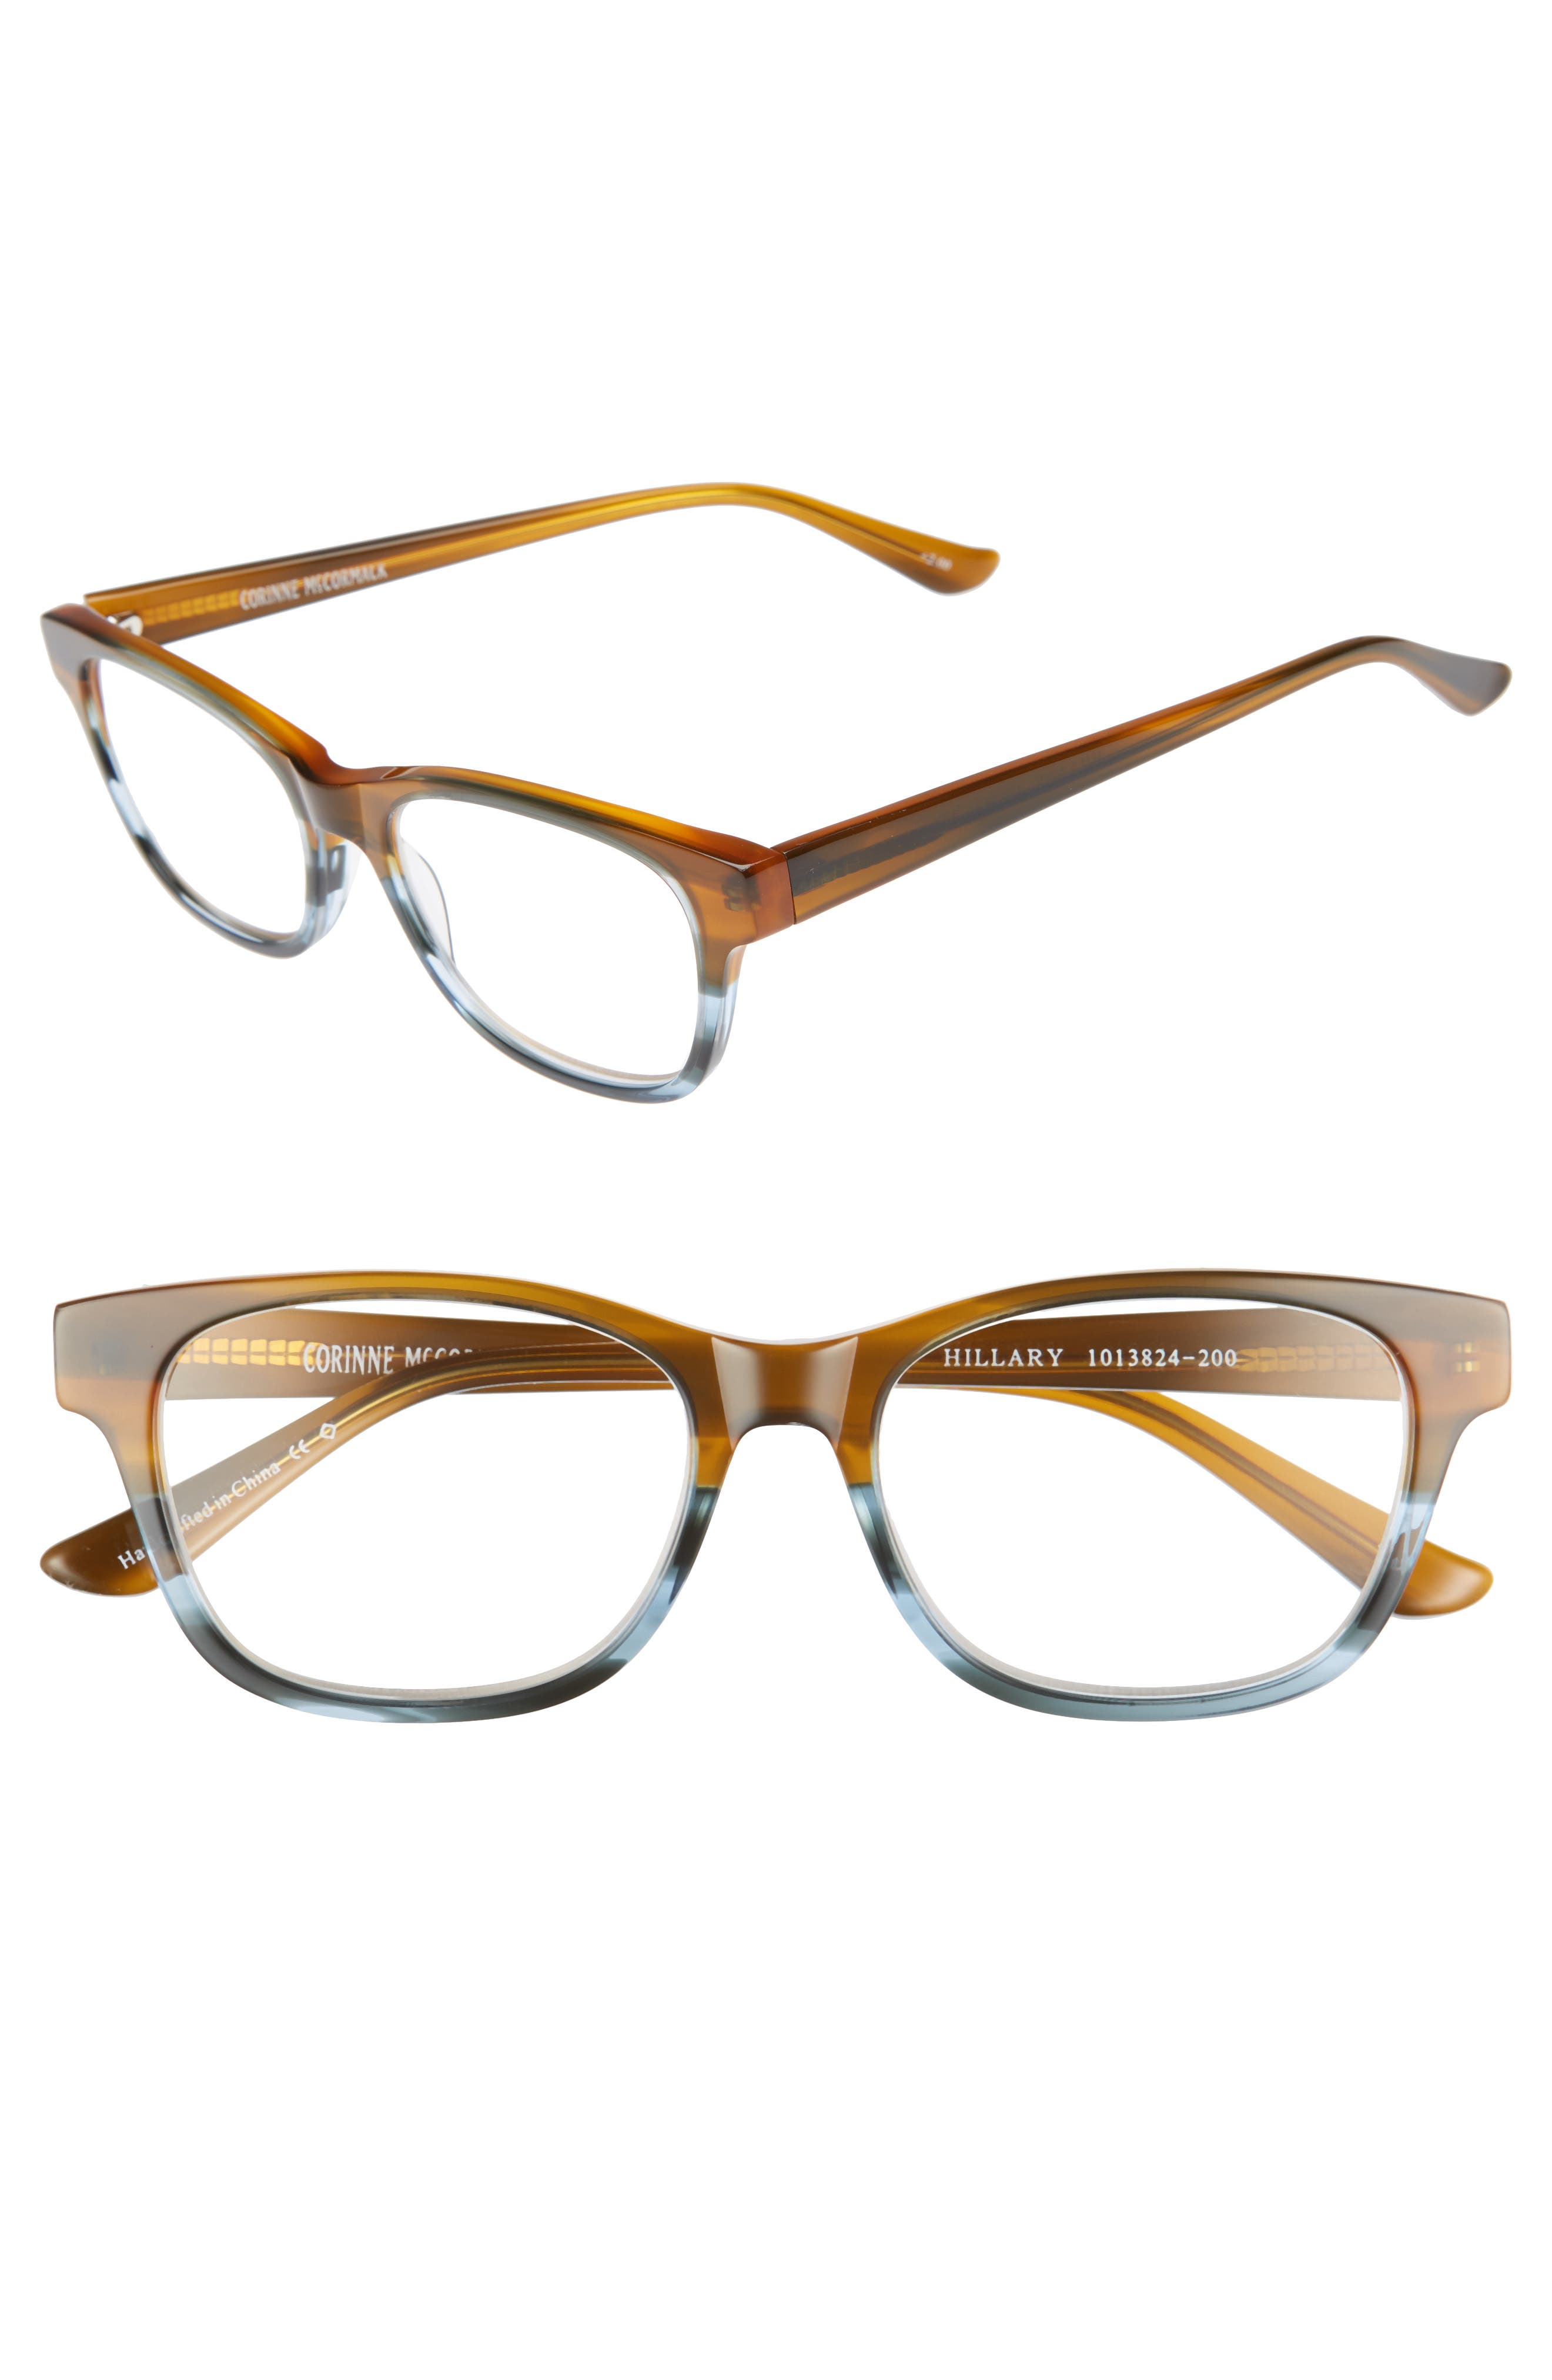 Corinne McCormack Hillary 50mm Reading Glasses